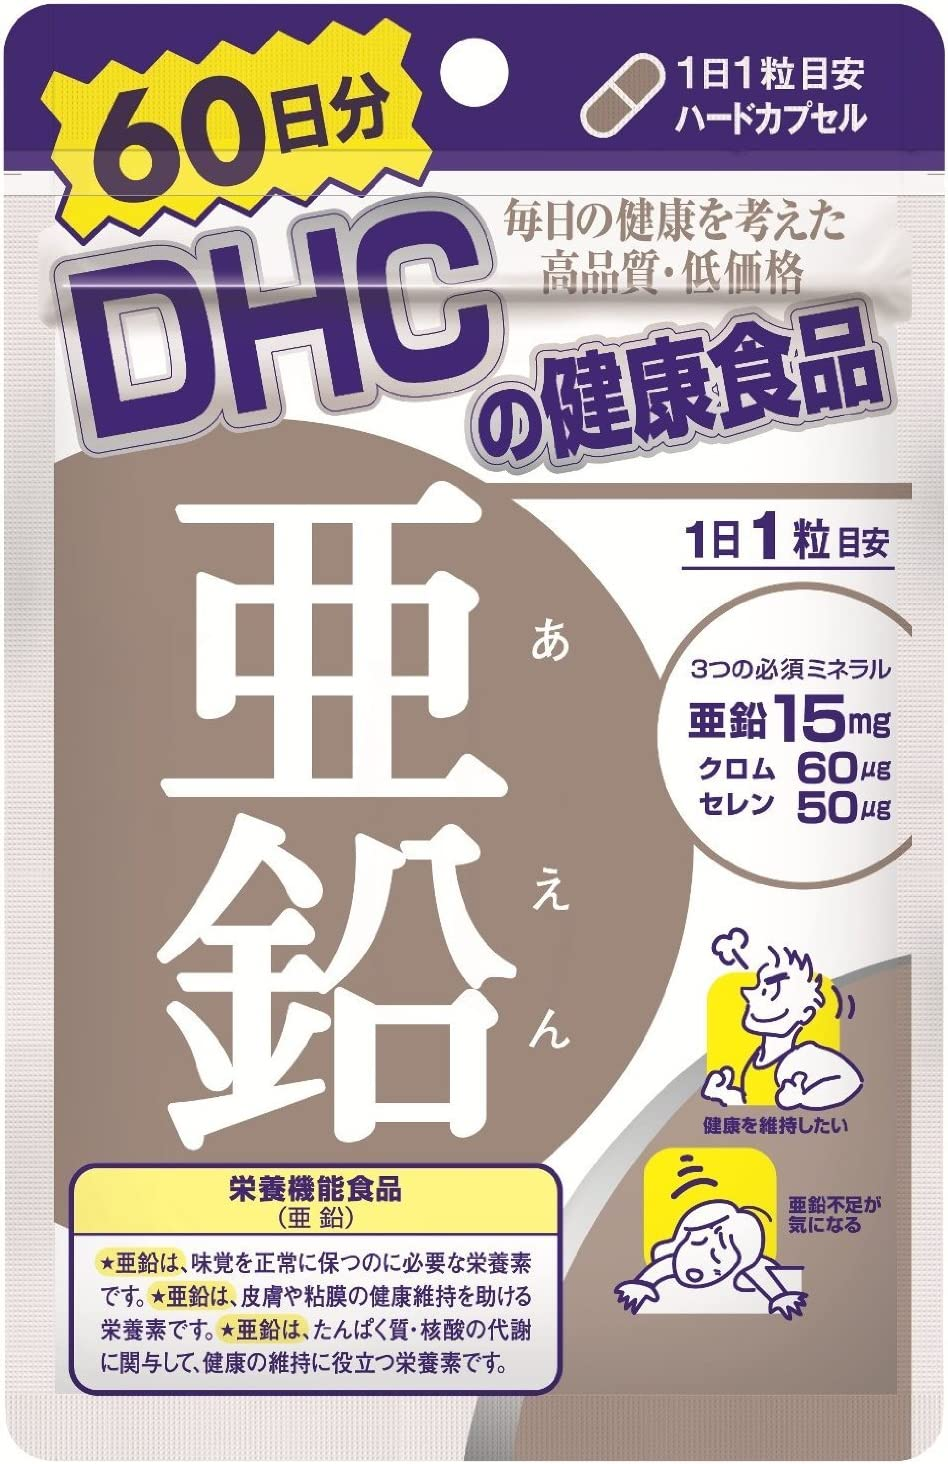 DHC製の亜鉛アプリの画像